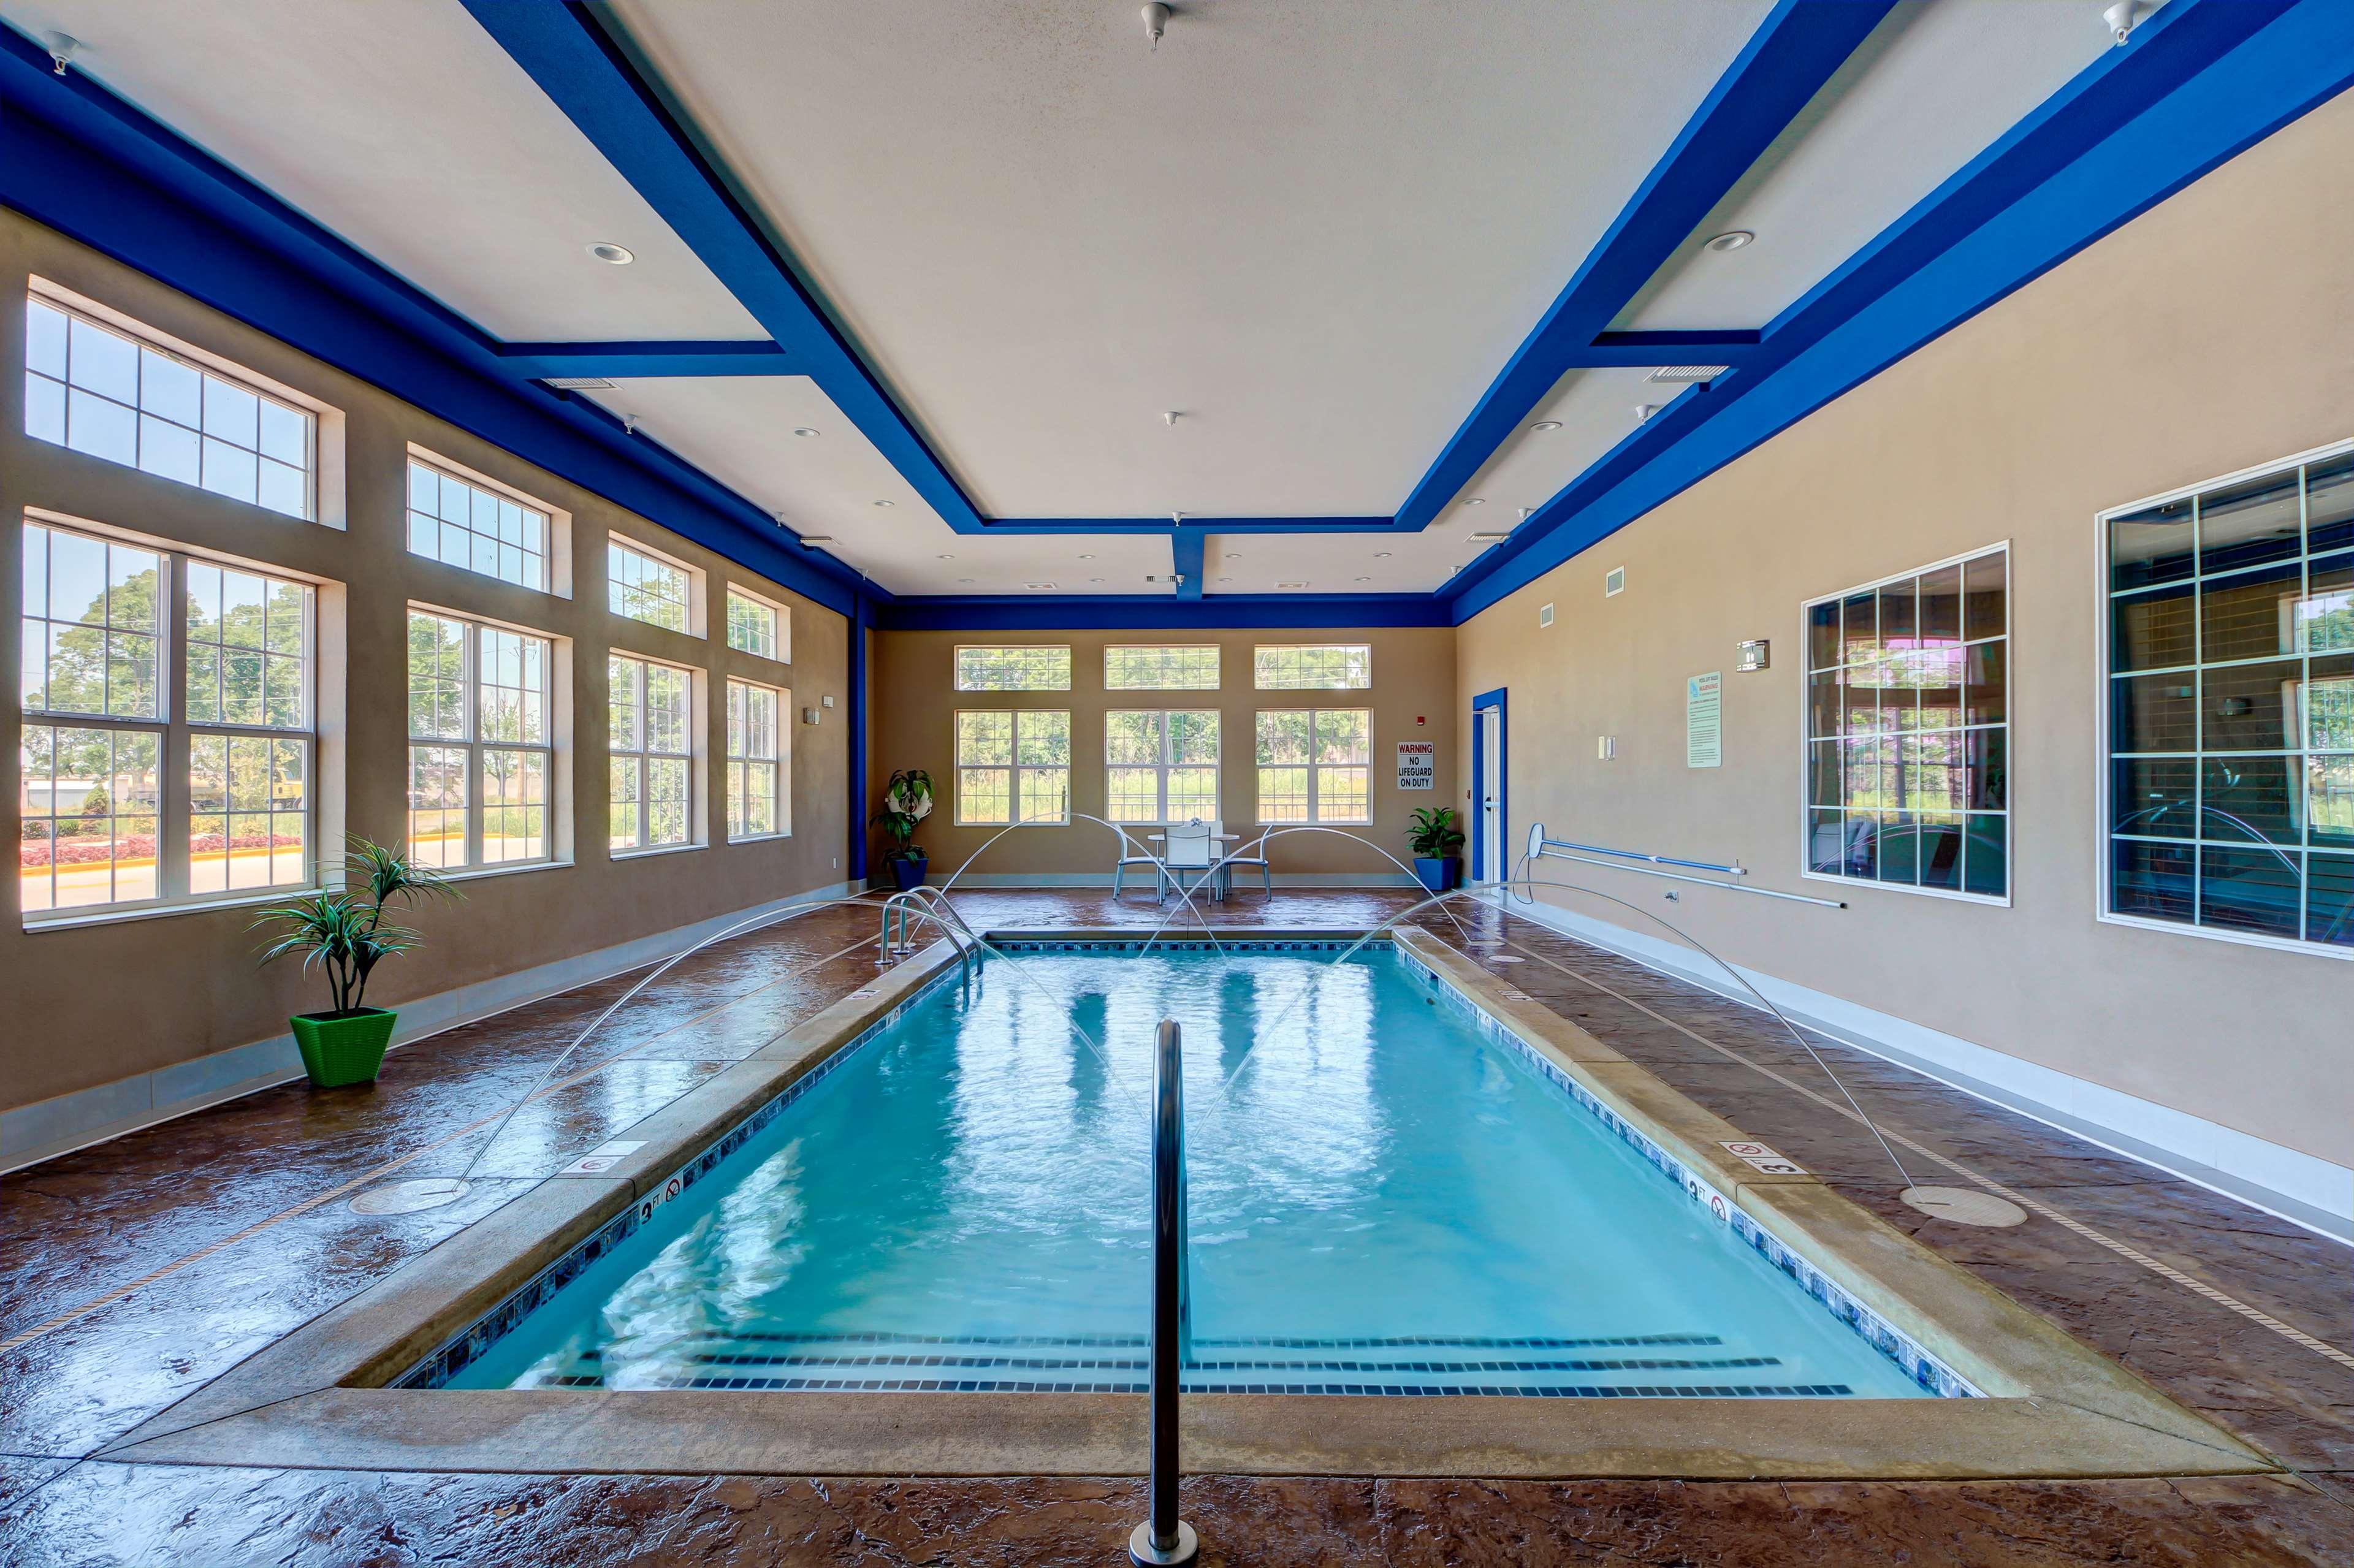 Best Western Plus The Inn Amp Suites At Muskogee Muskogee